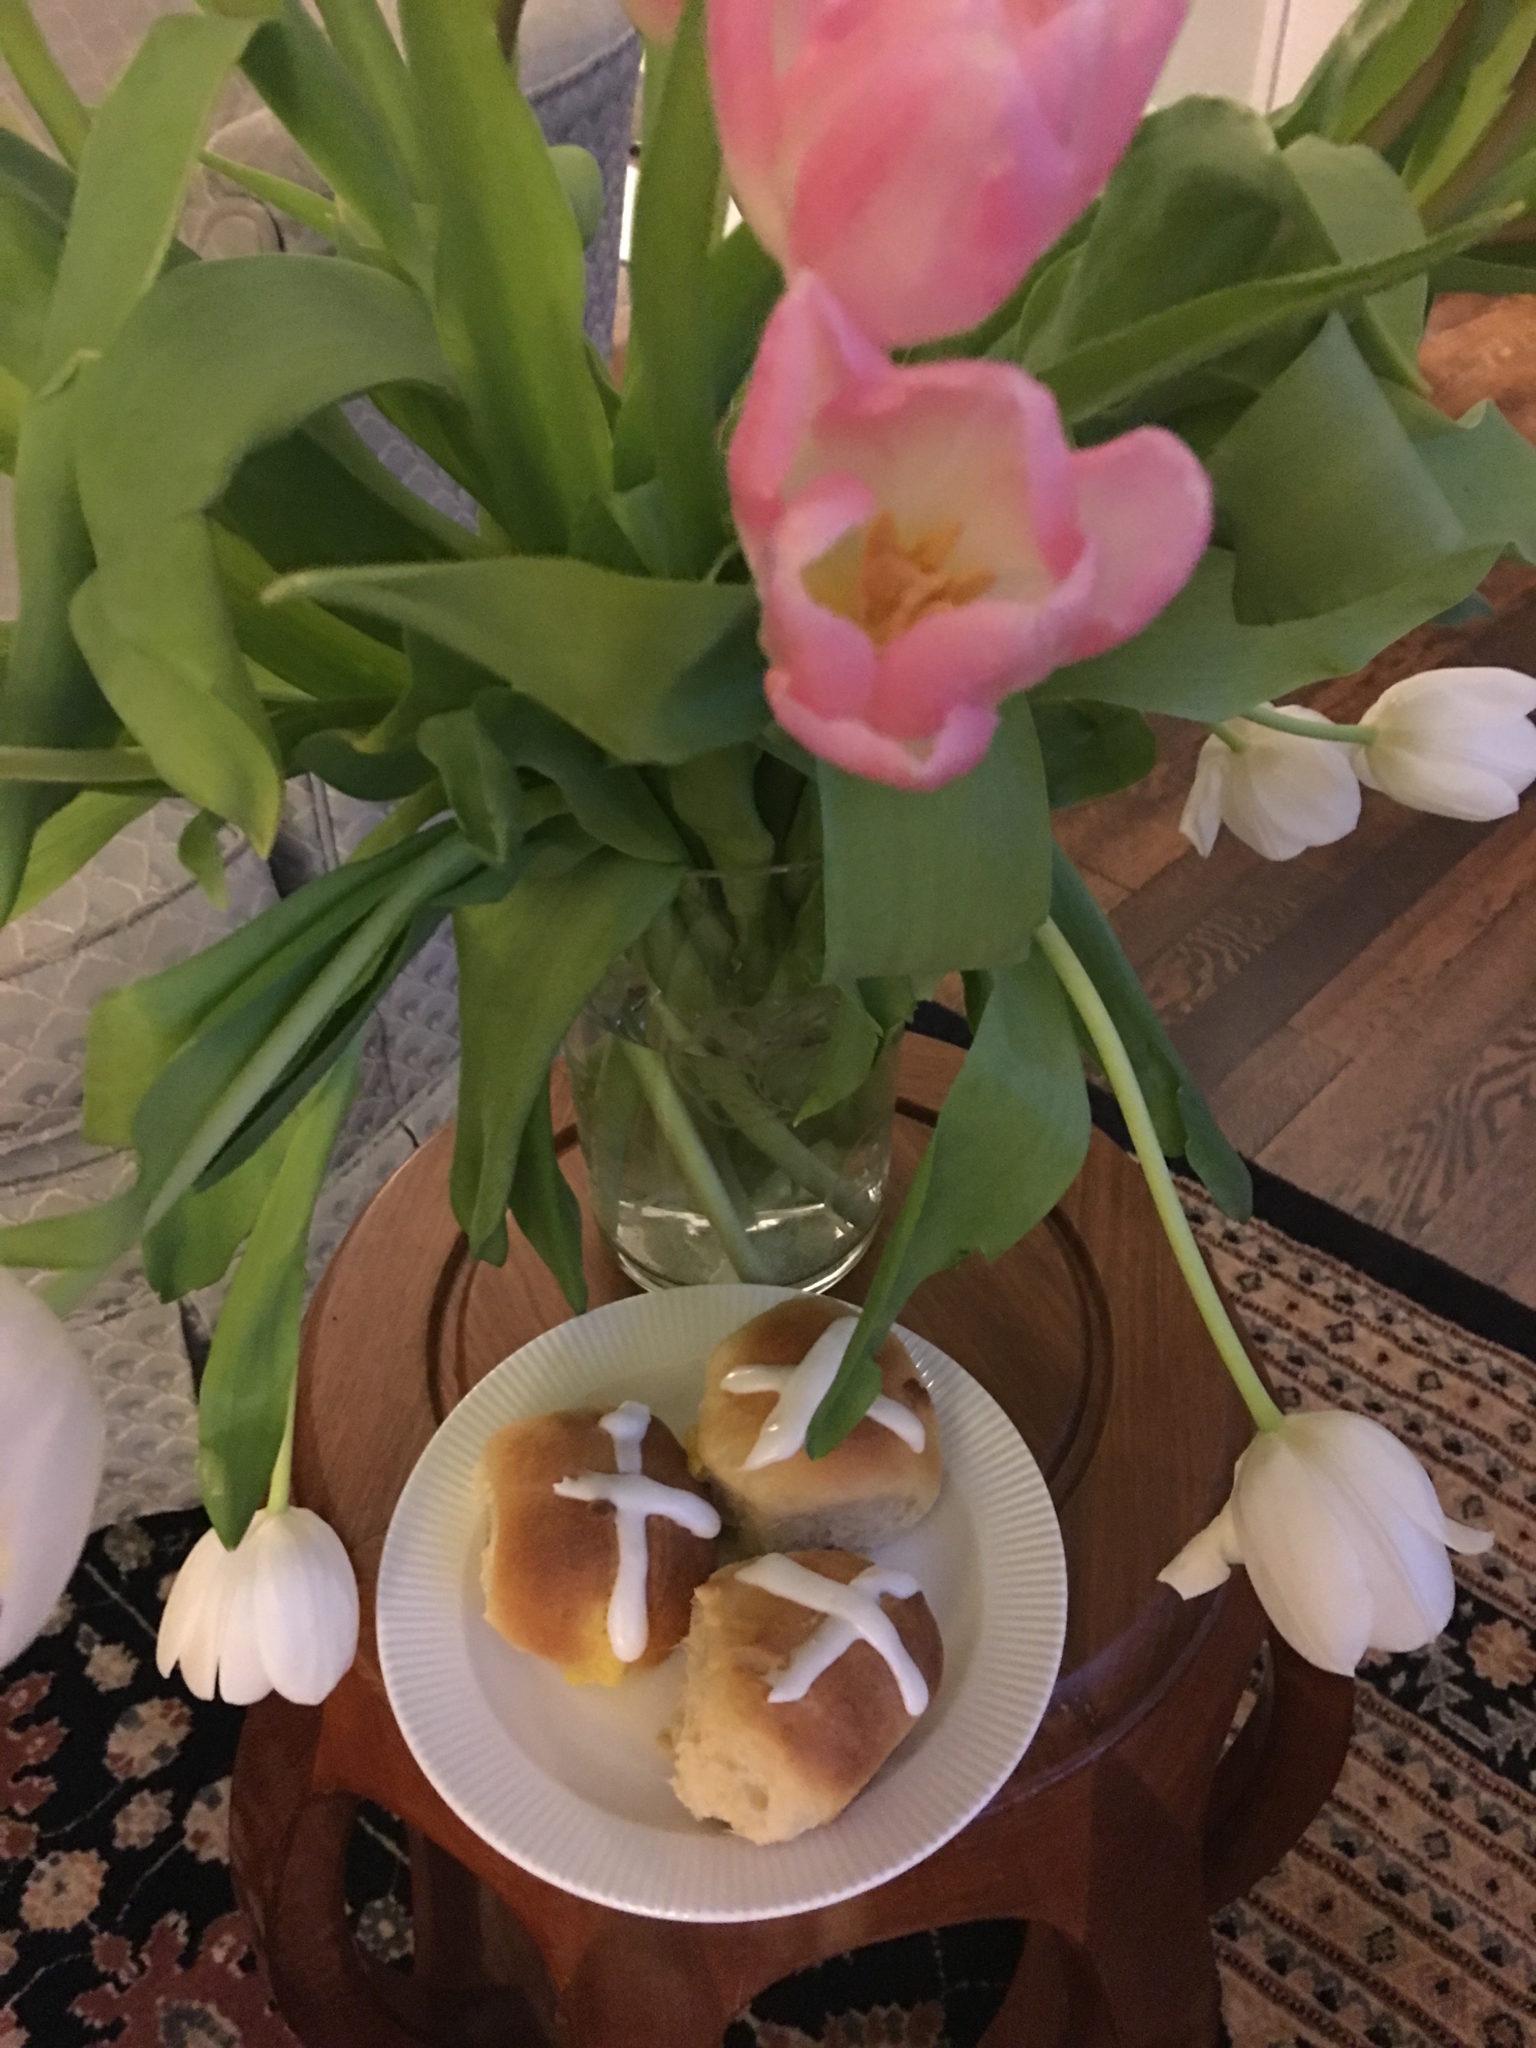 Hot Cross Buns under tulips